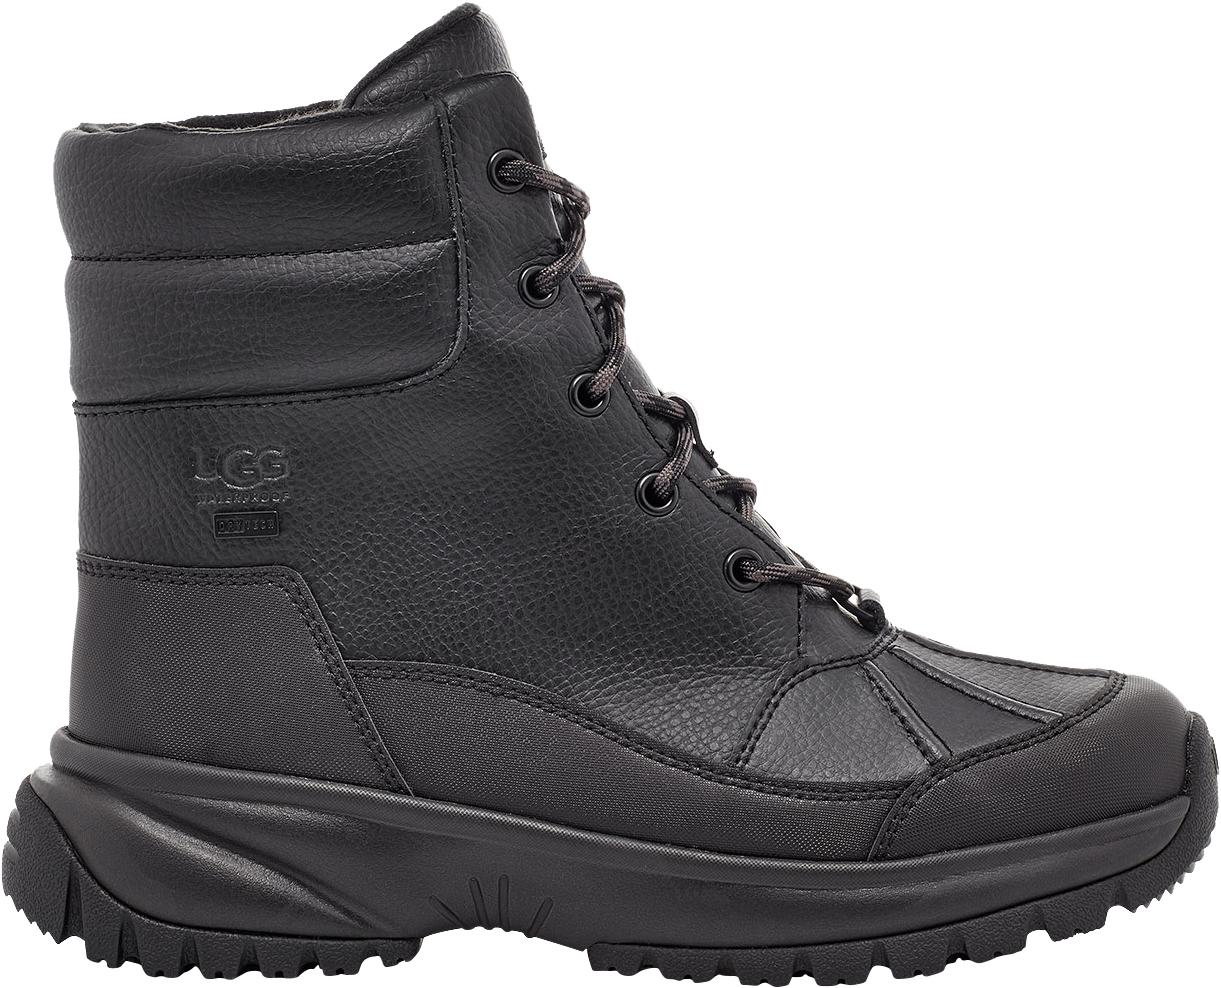 UGG Yose Waterproof Winter Boots